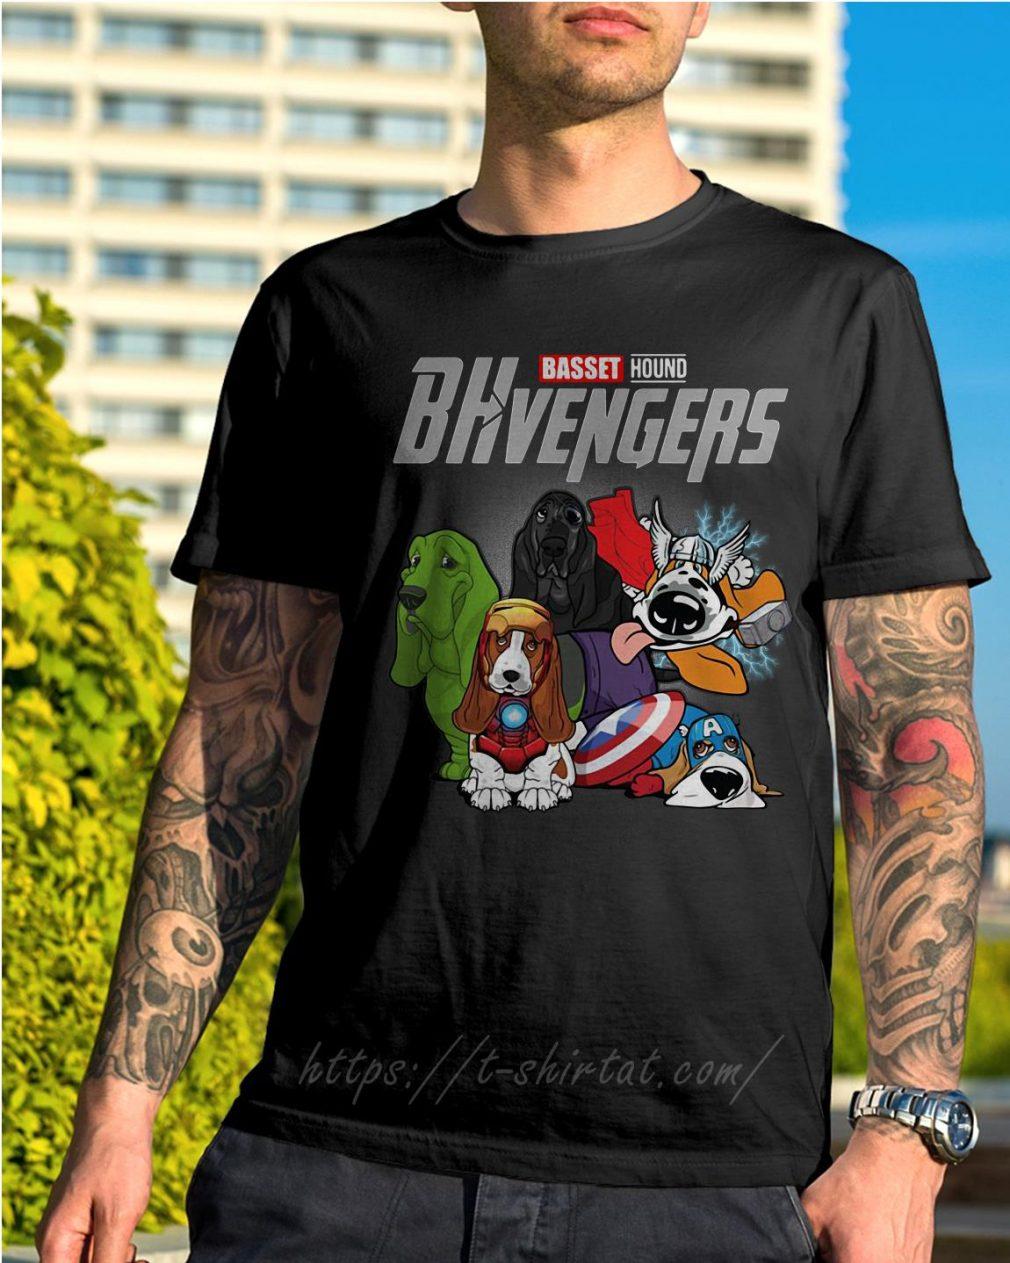 Marvel Basset hound BHvengers shirt